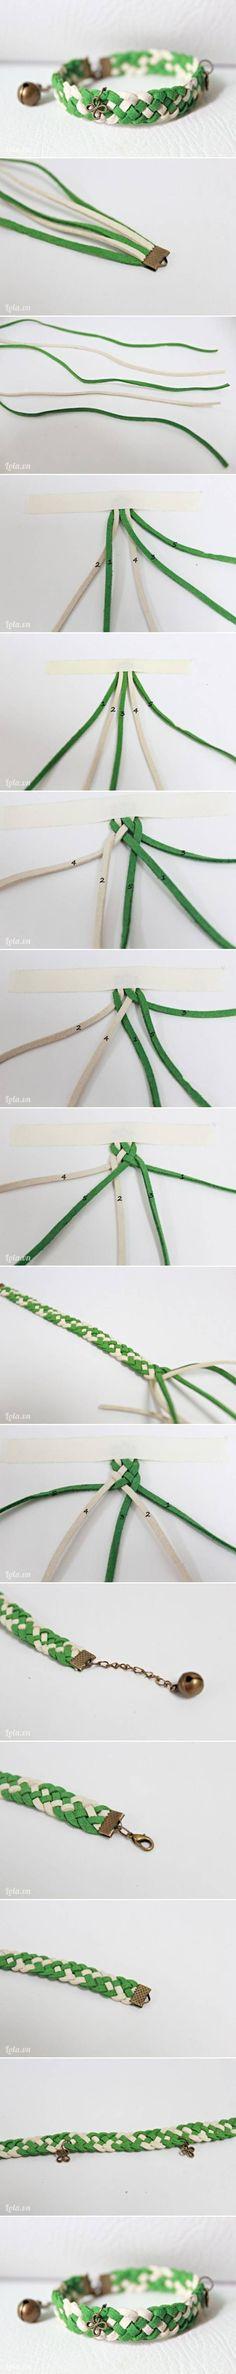 DIY Nice Spring Wristband DIY Nice Spring Wristband